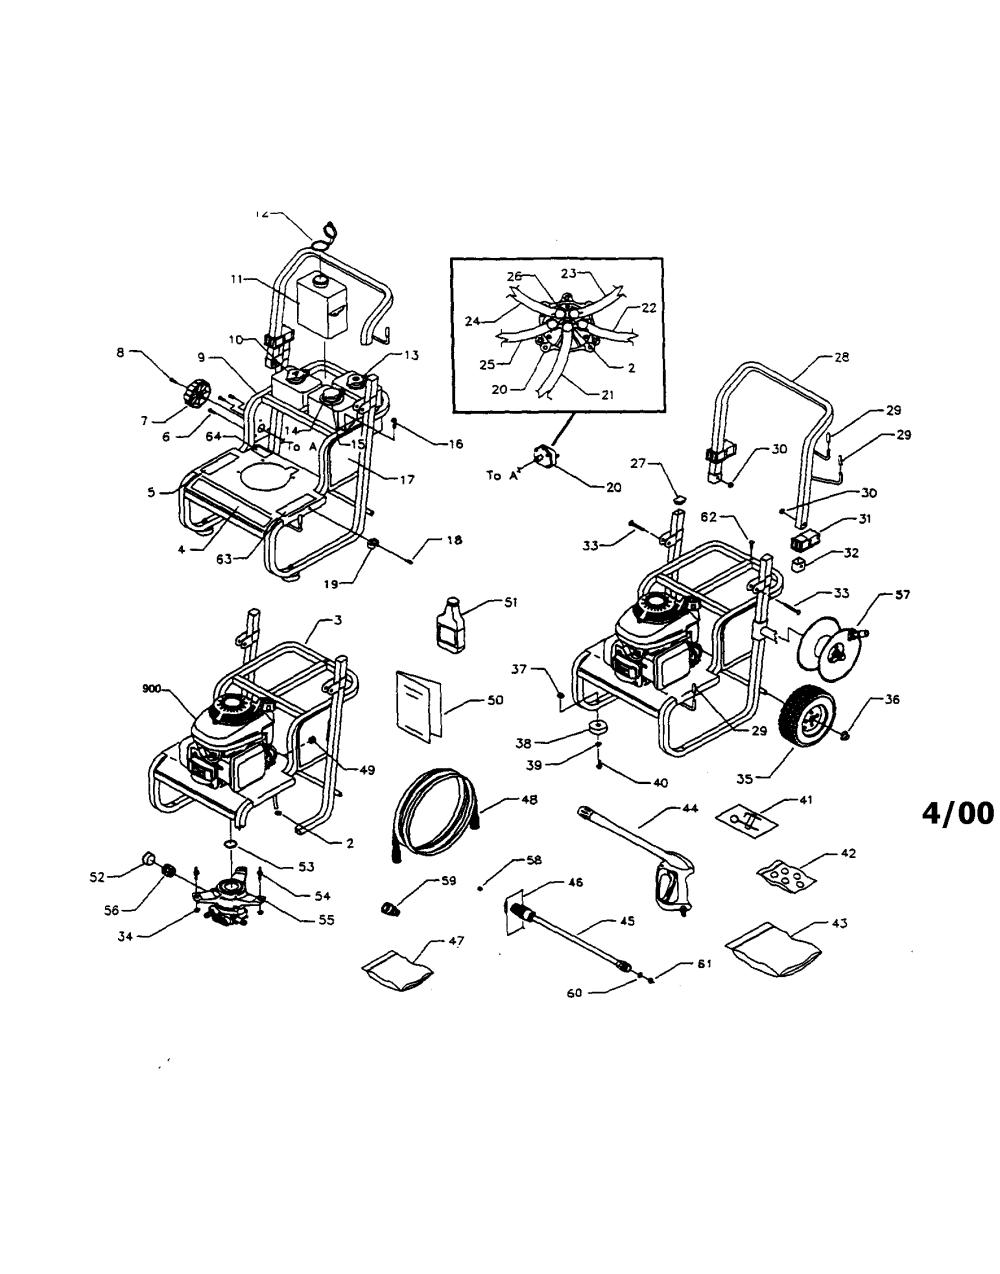 medium resolution of honda gc160 5 0 engine spring diagram